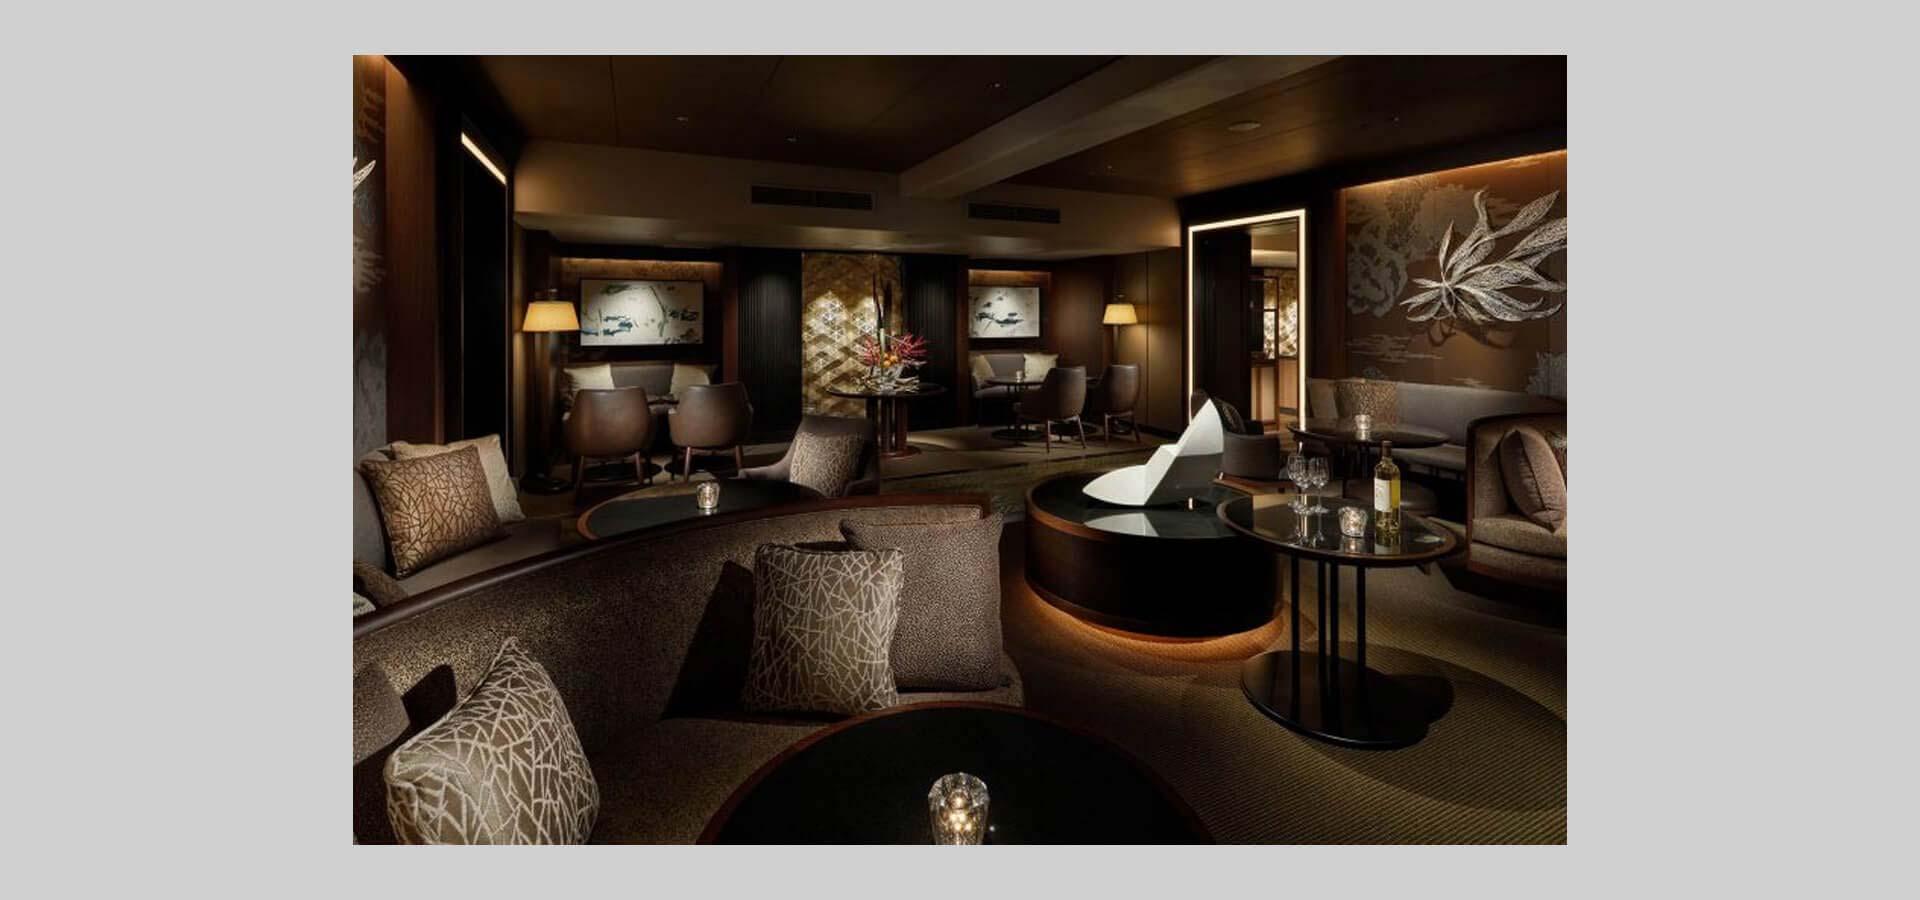 2018.12.8 Club Lounge Renewal Open